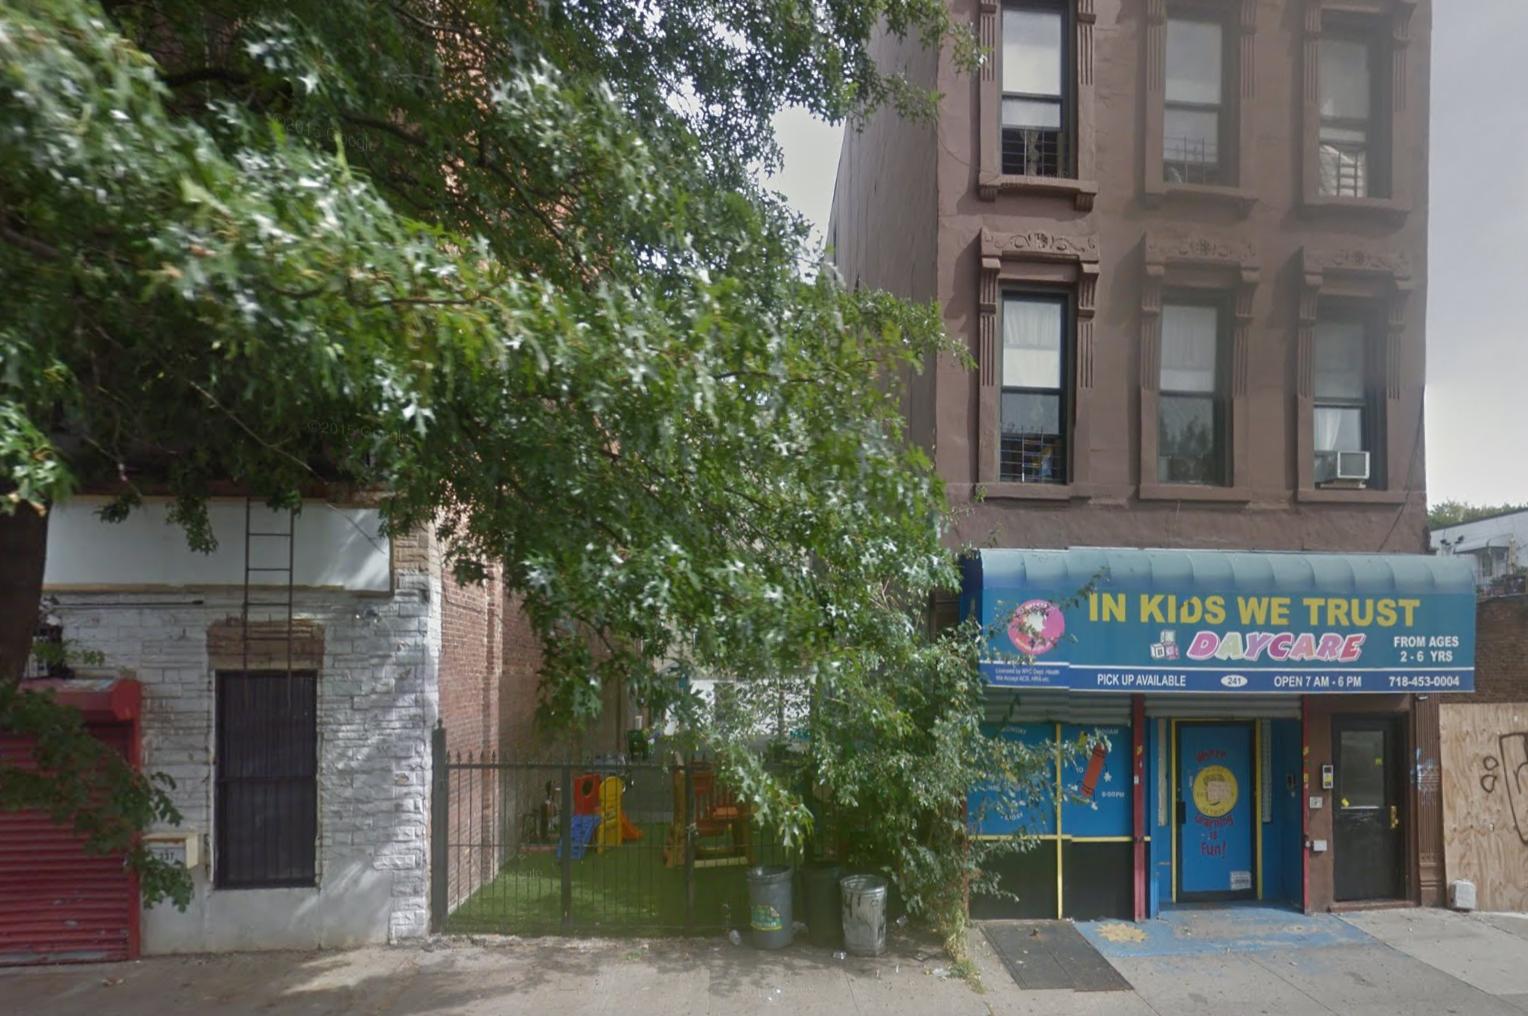 239 Marcus Garvey Boulevard, image via Google Maps